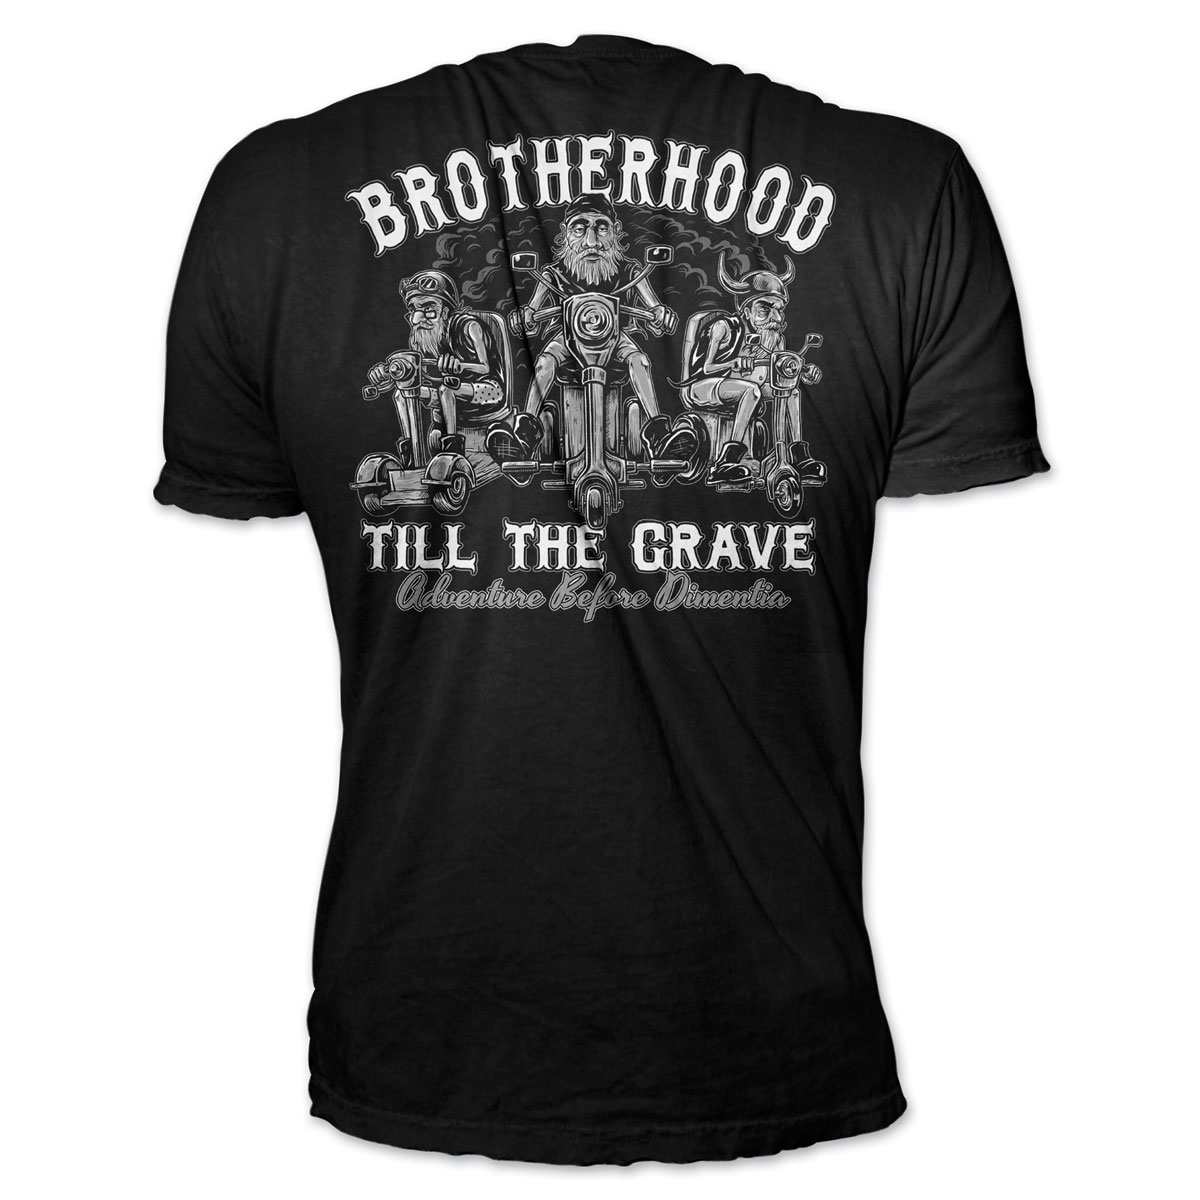 Lethal Threat Brotherhood Till the Grave Black T-shirt